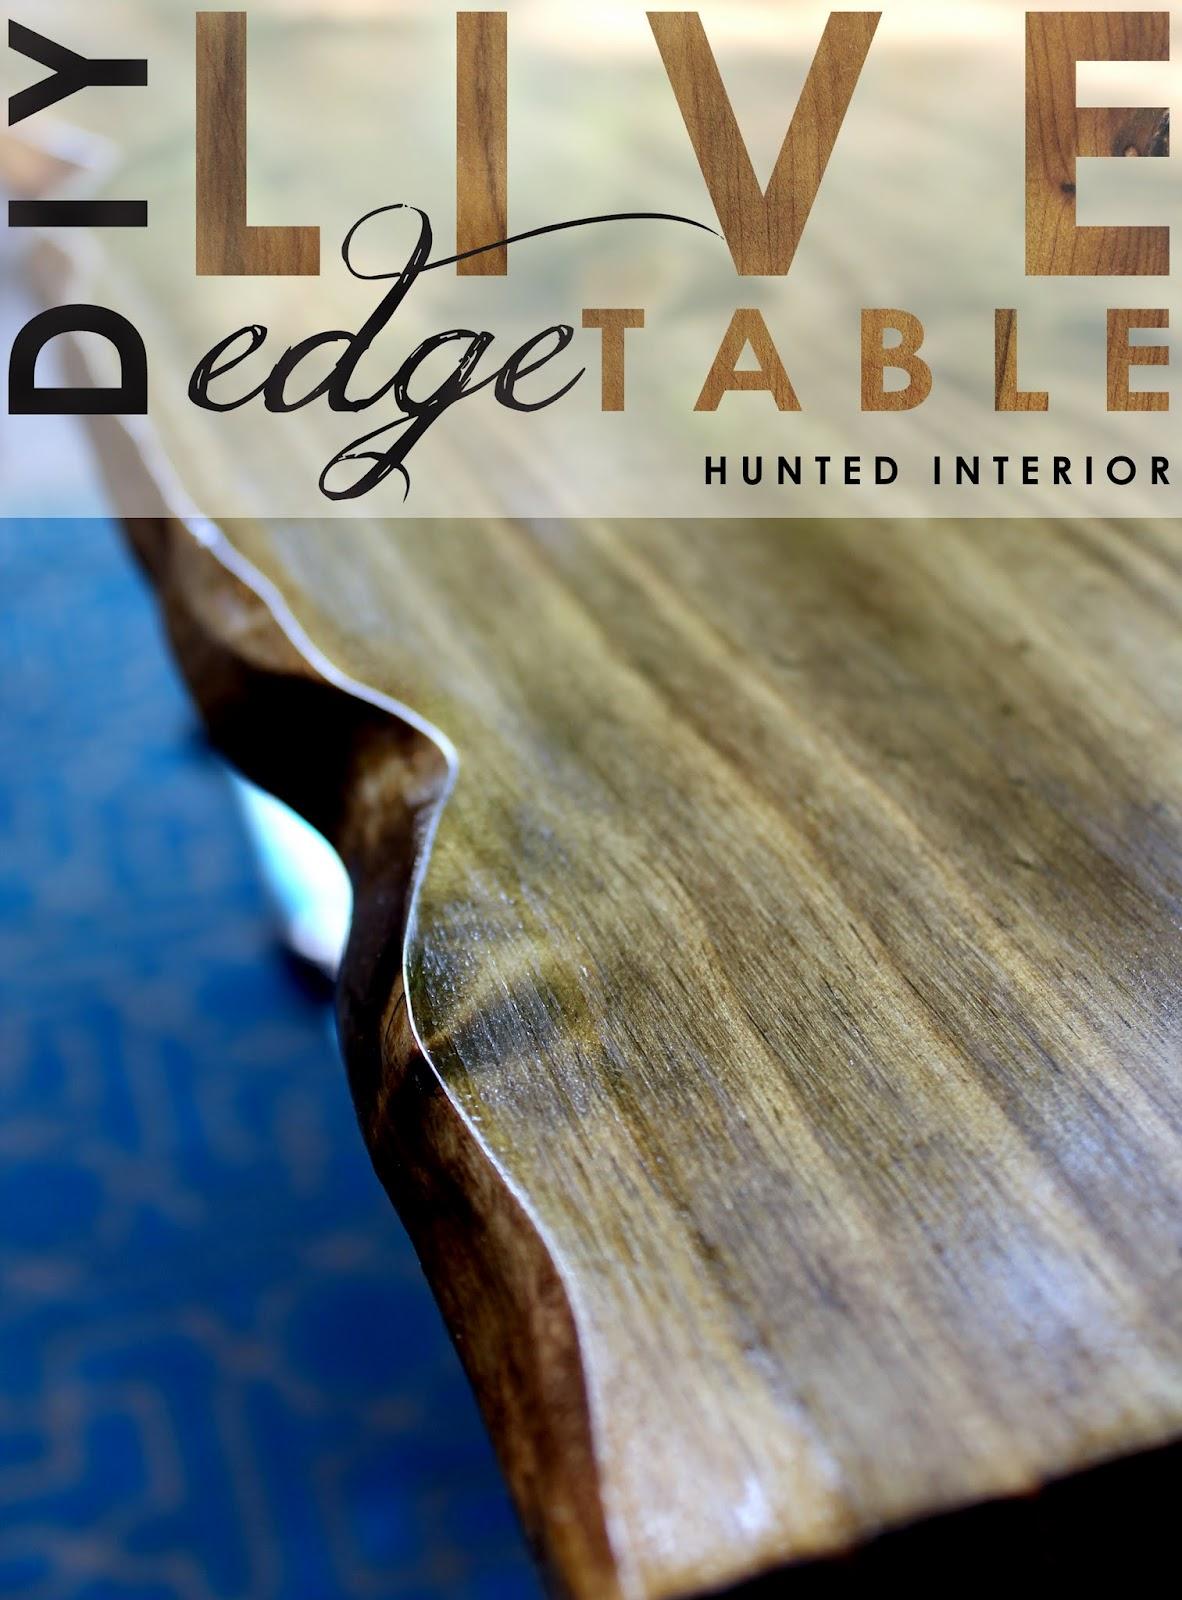 hunted interior: DIY Live Edge Table